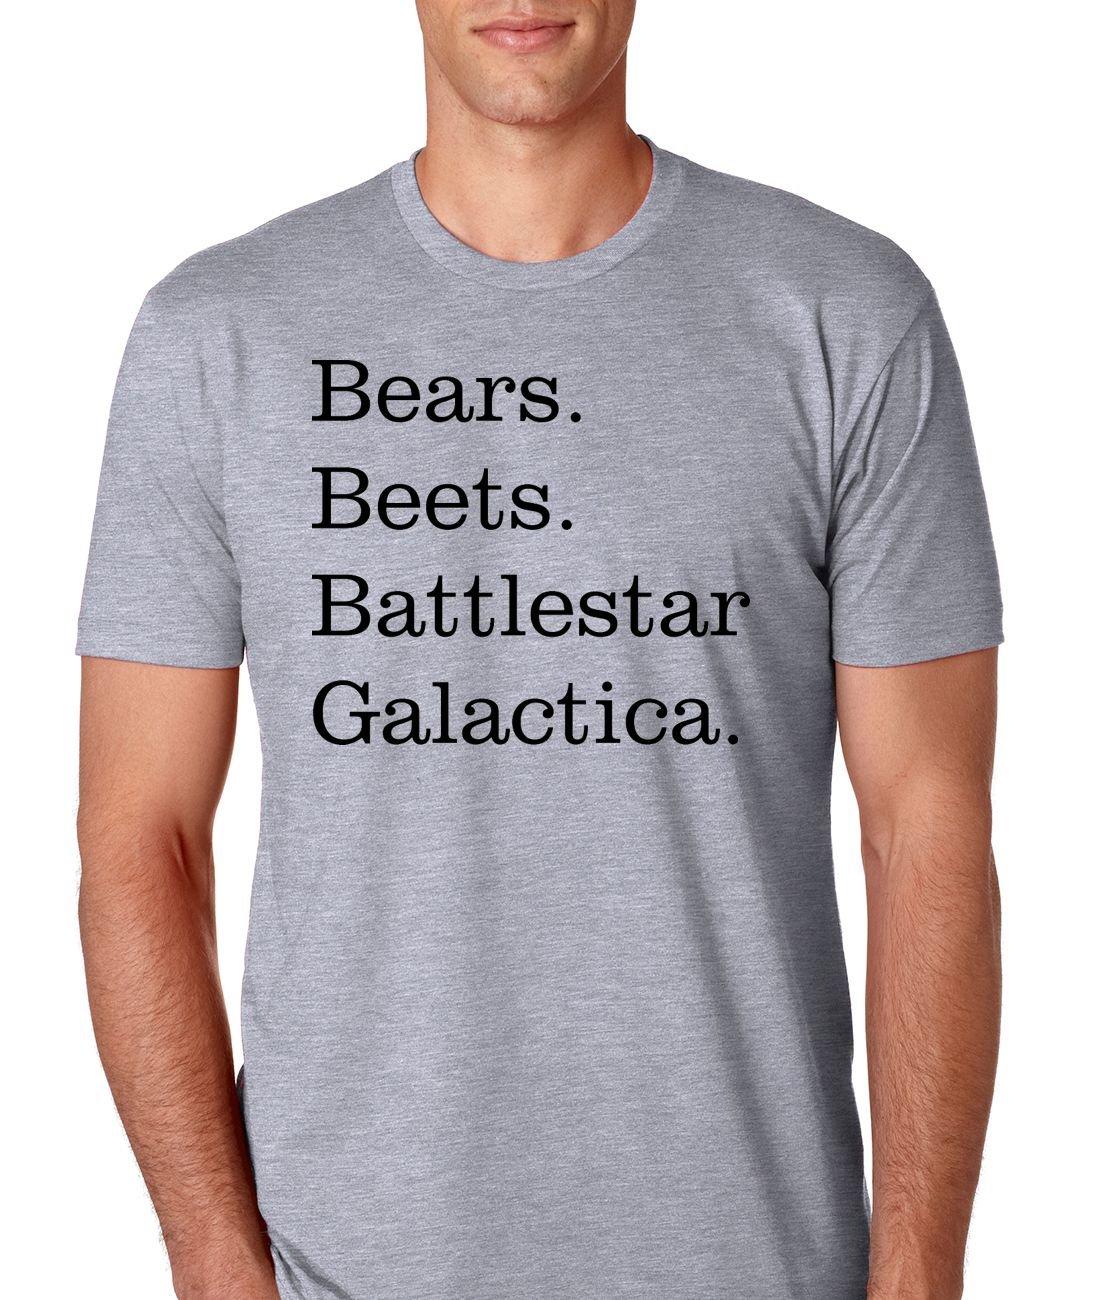 e11528b8d NorthStarTees The Office Bears Beets Battlestar Galactica Mens Athletic Fit  T-Shirt (Medium,